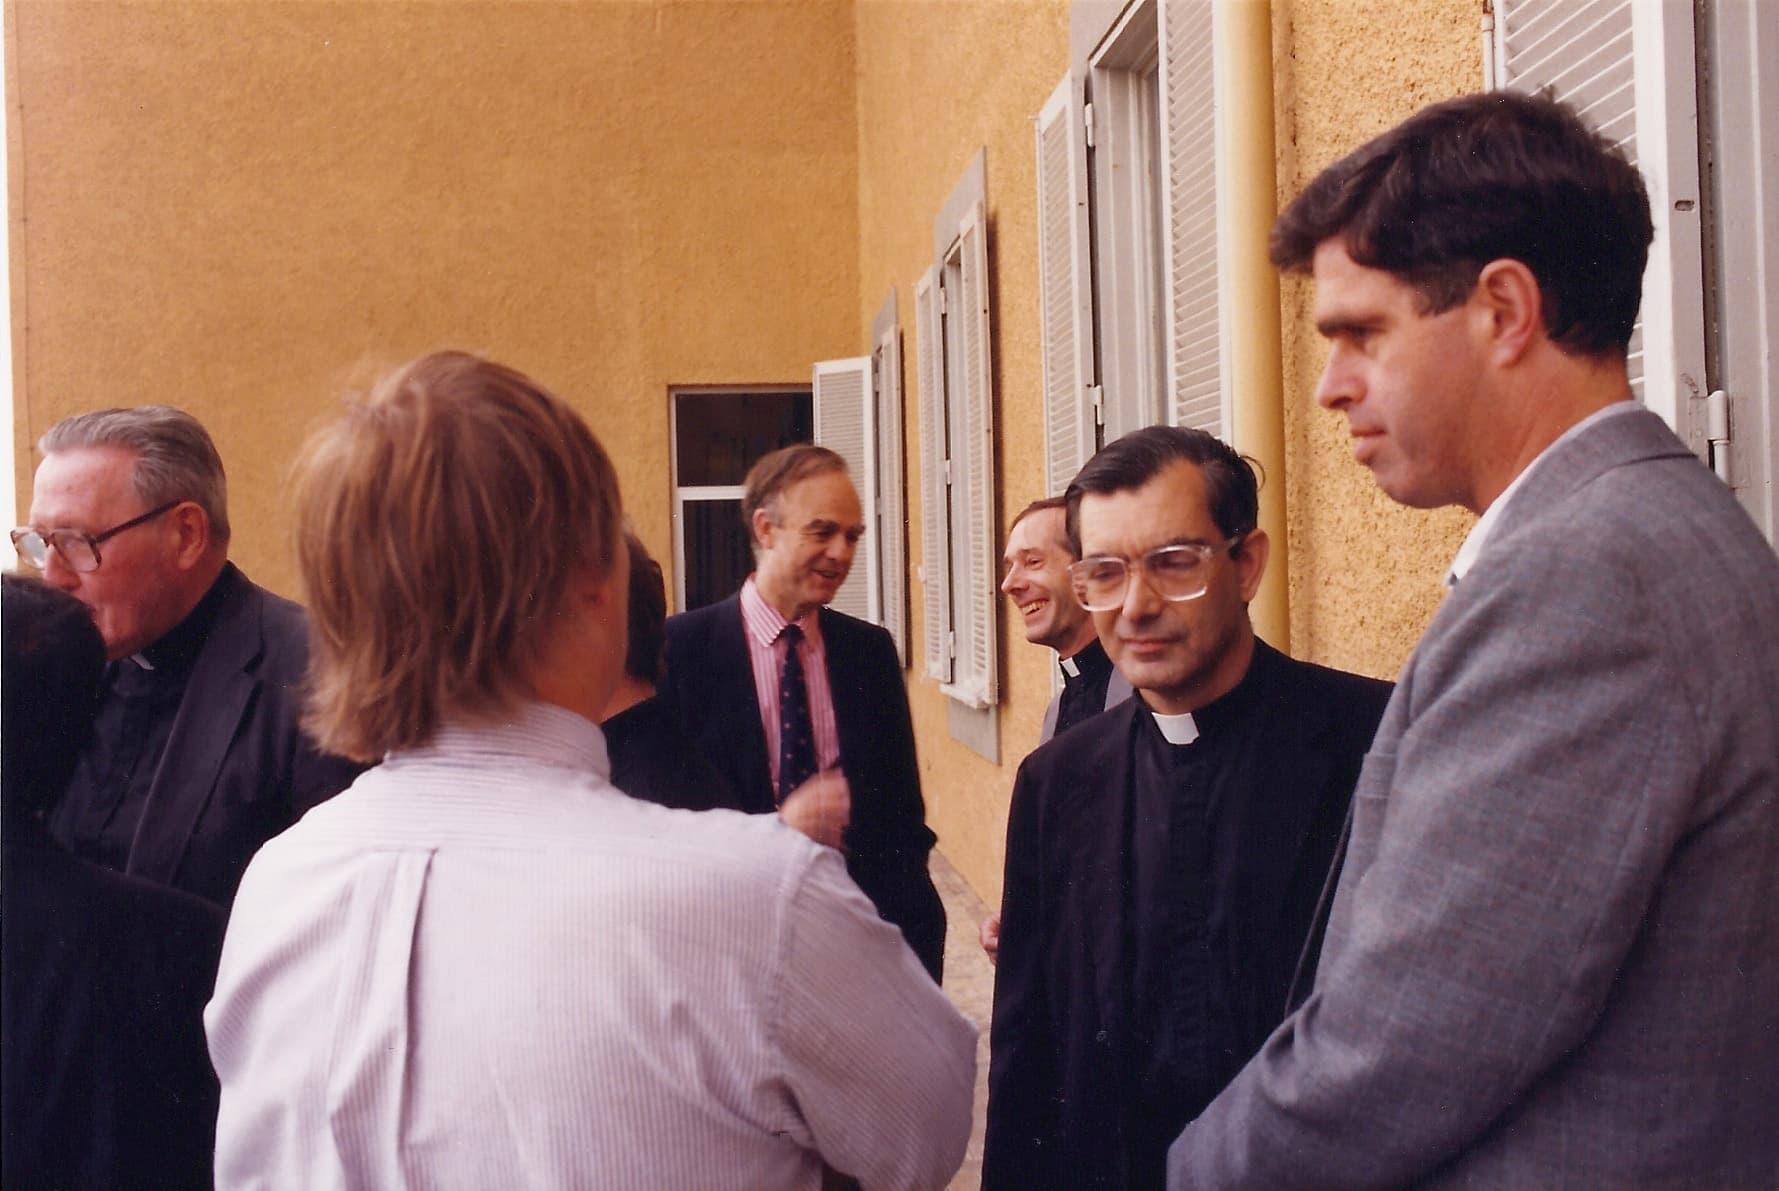 Vatican Observatory Summer School Faculty